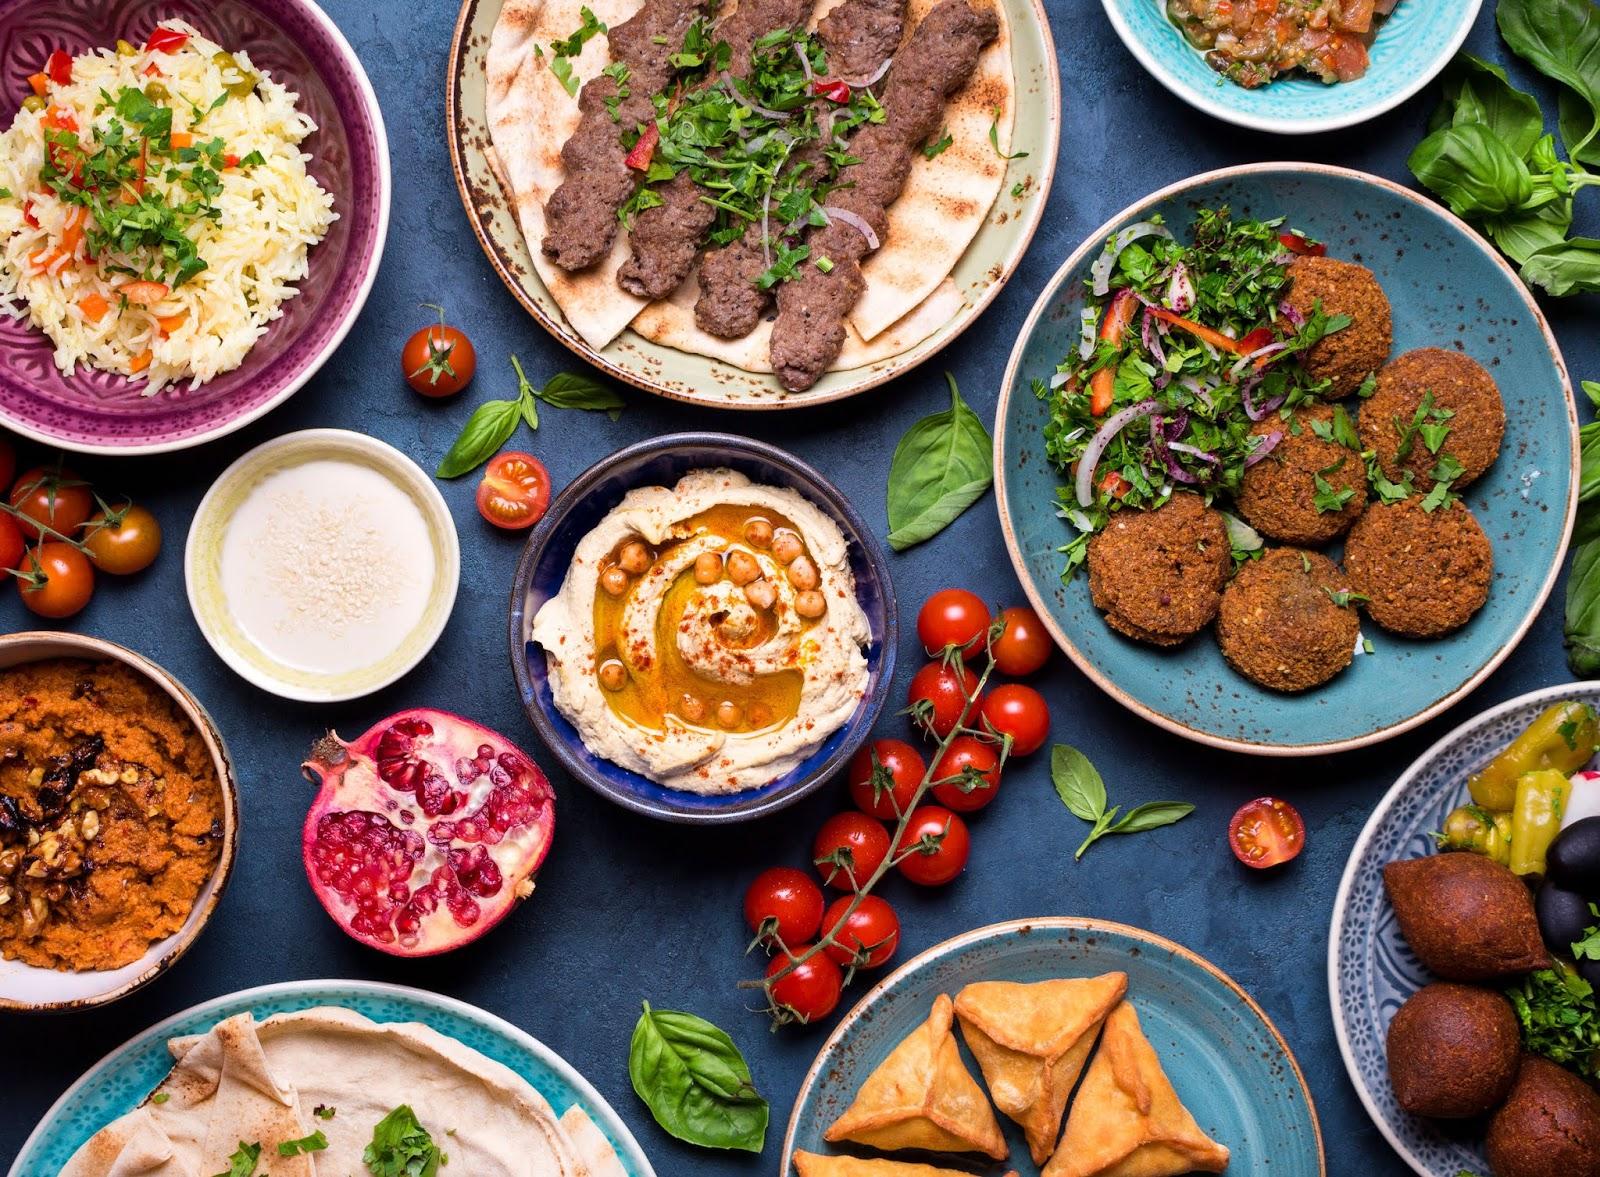 Bingung Buka Puasa Dimana Cari Dan Pesan Tempat Makan Di Aplikasi Voucher Hotel Ritz Carlton Resto Asia Chope Aja